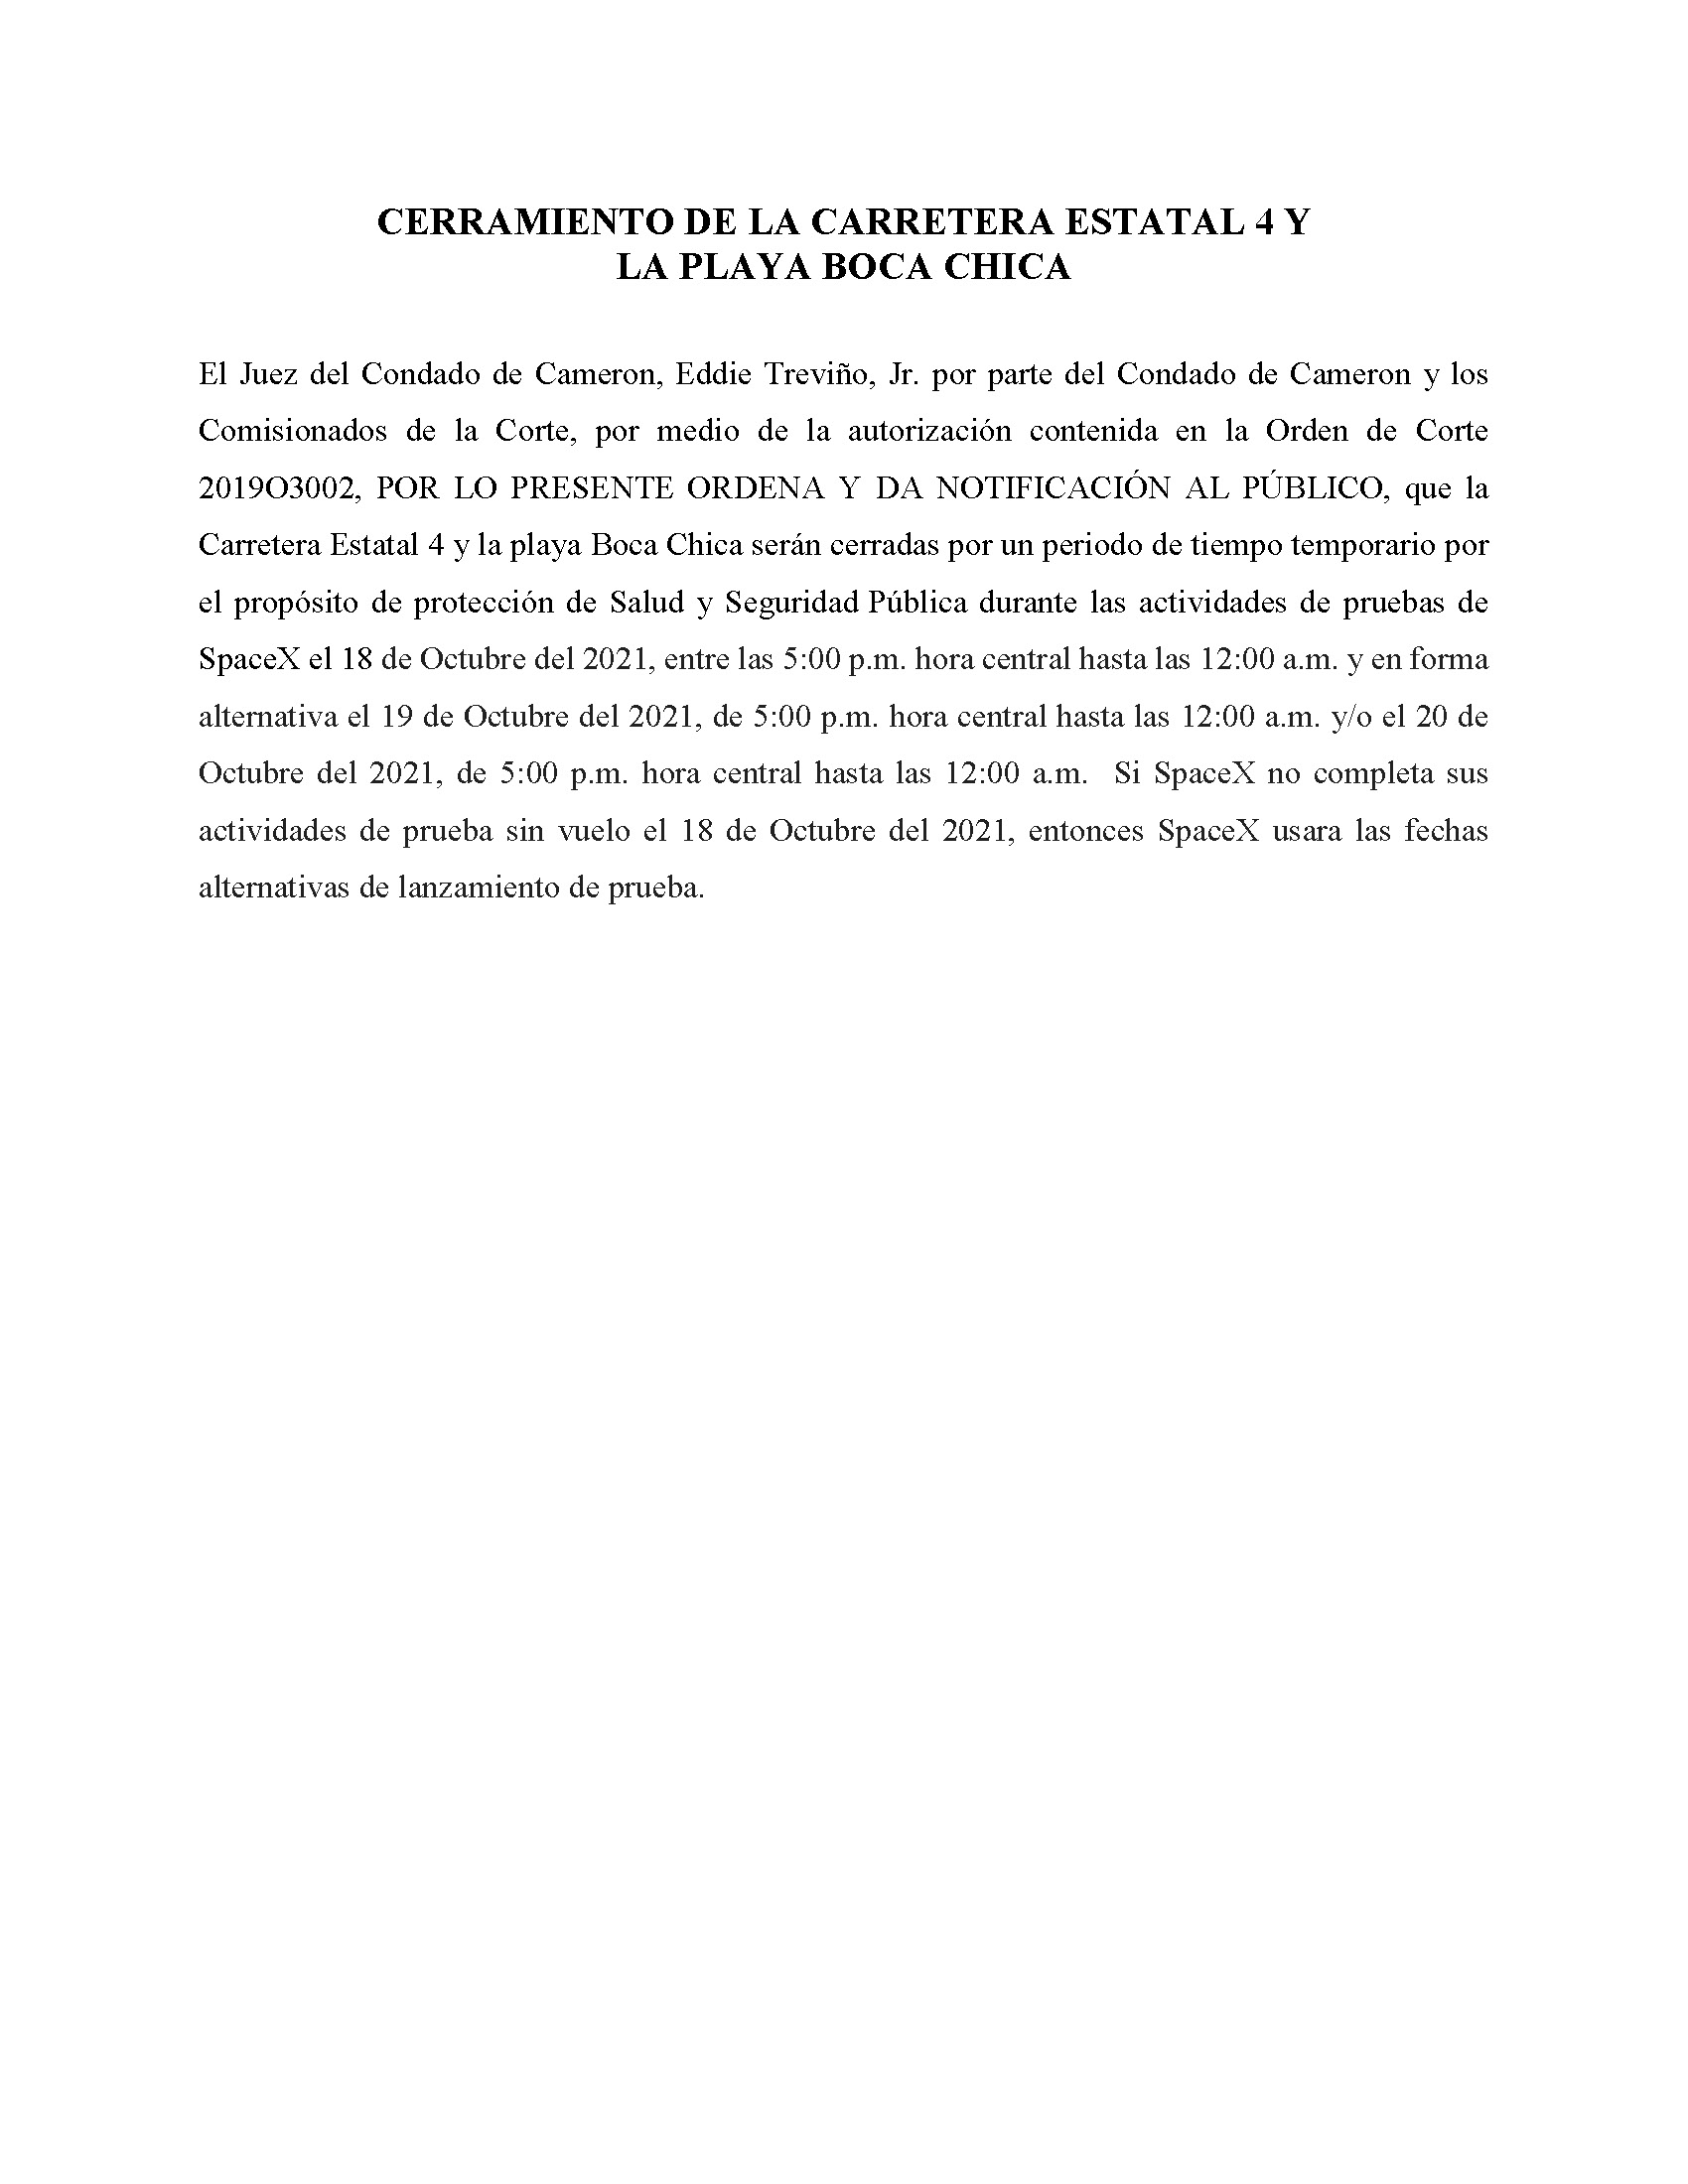 ORDER.CLOSURE OF HIGHWAY 4 Y LA PLAYA BOCA CHICA.SPANISH.10.18.2021